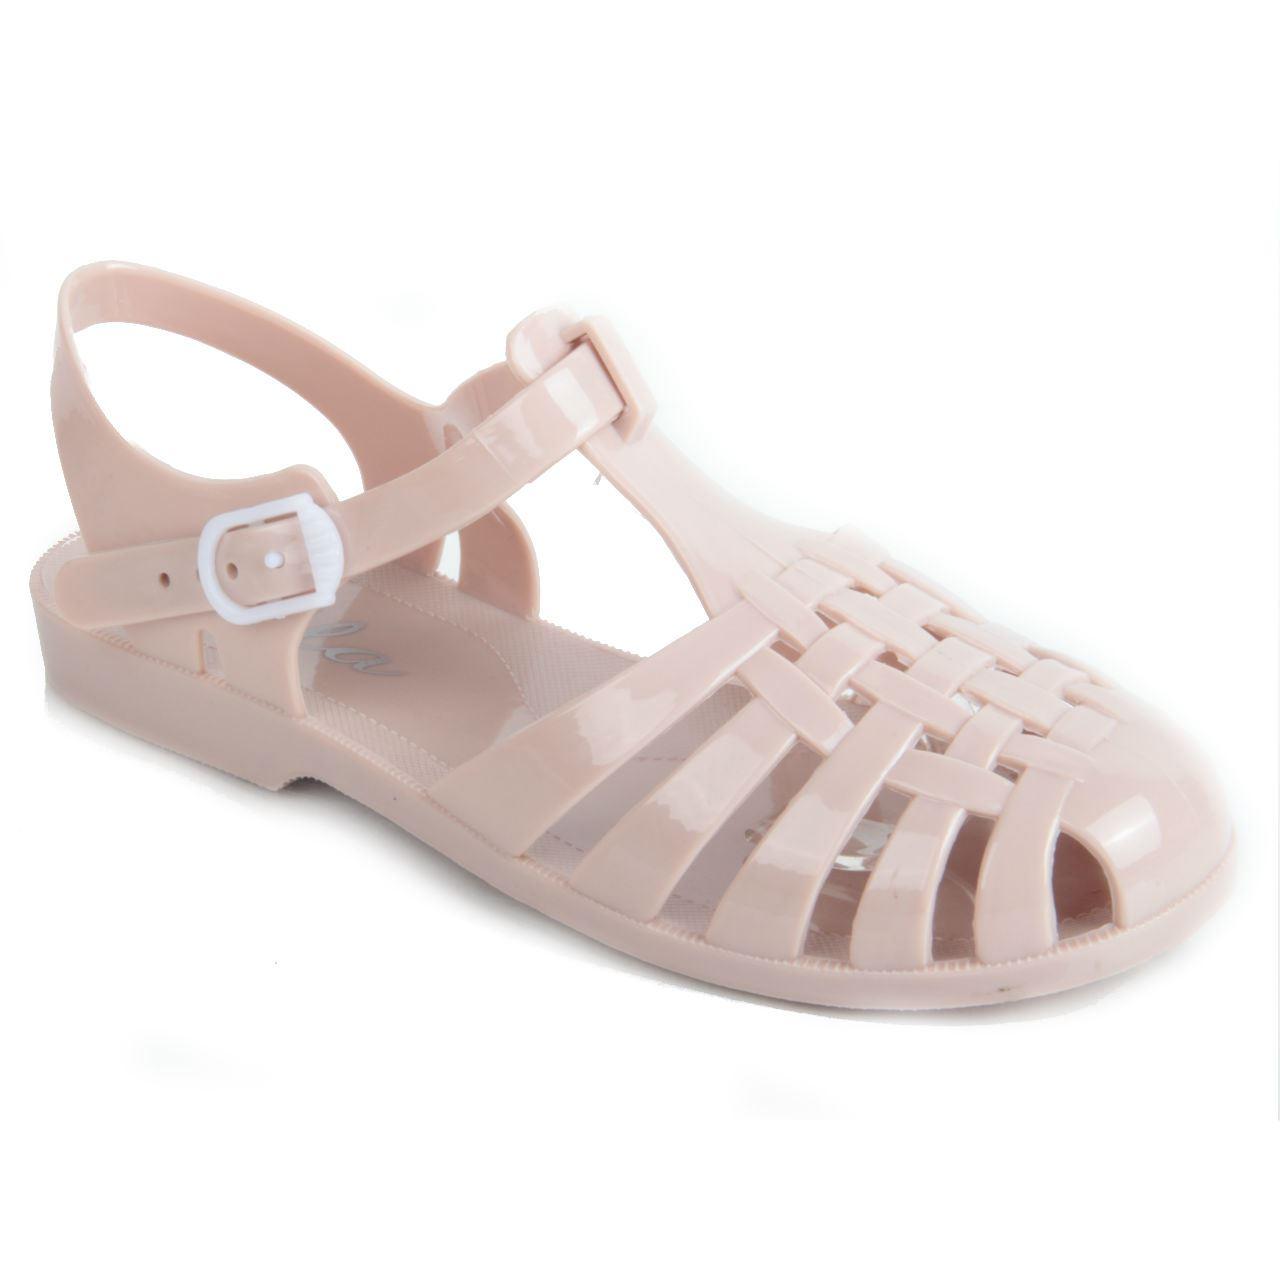 womens jellies jelly bean flat shoes juju summer plastic